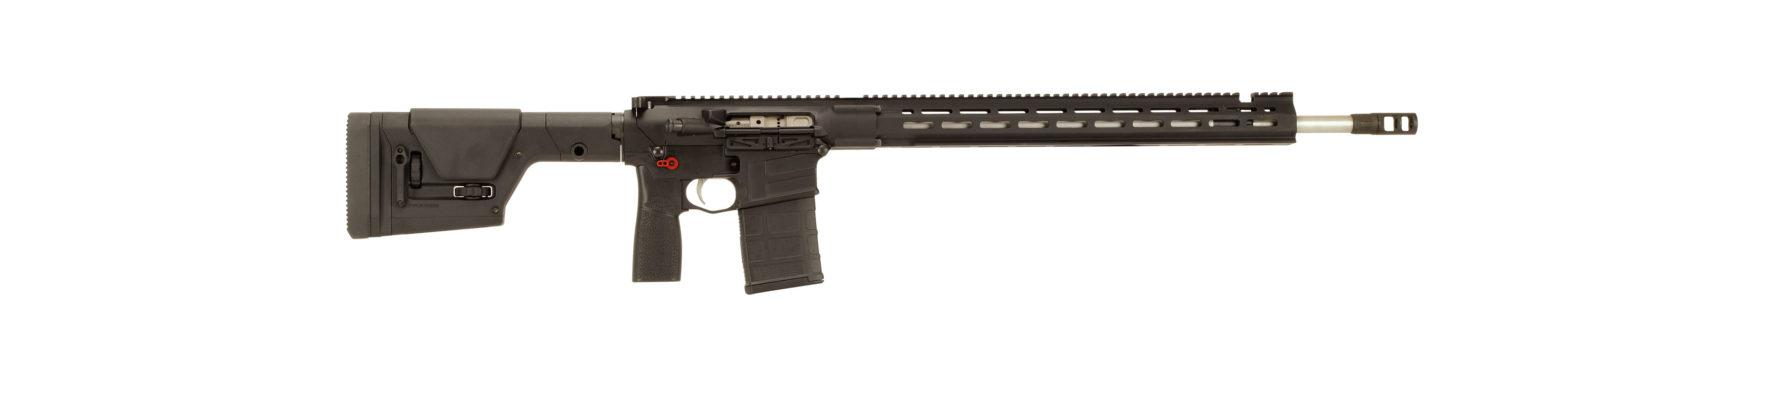 MSR 10 Precision Savage